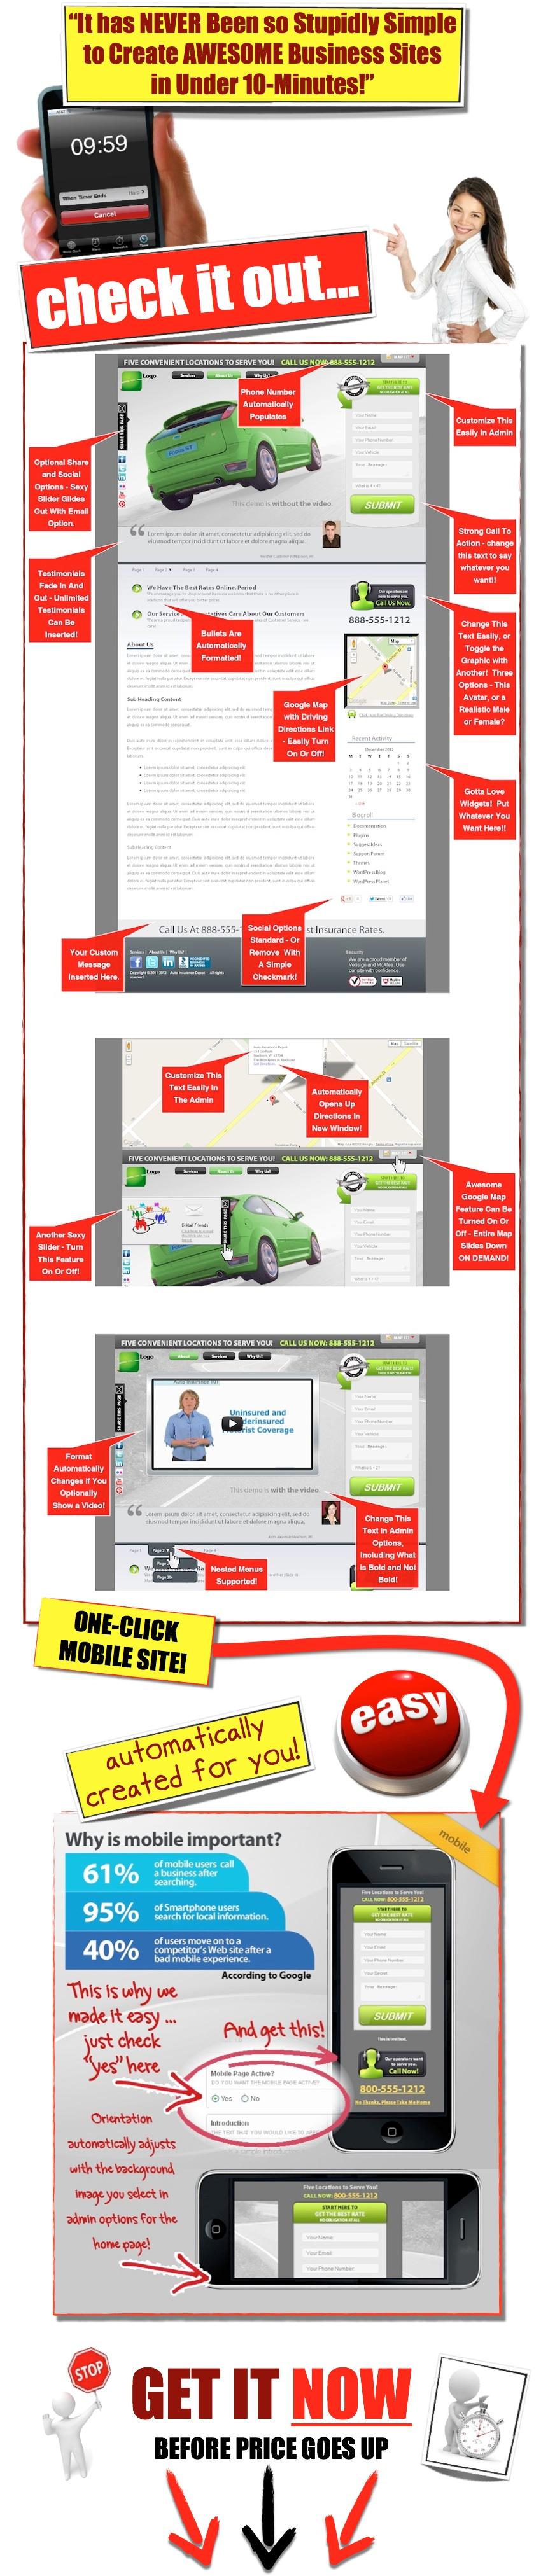 Salespage image 1